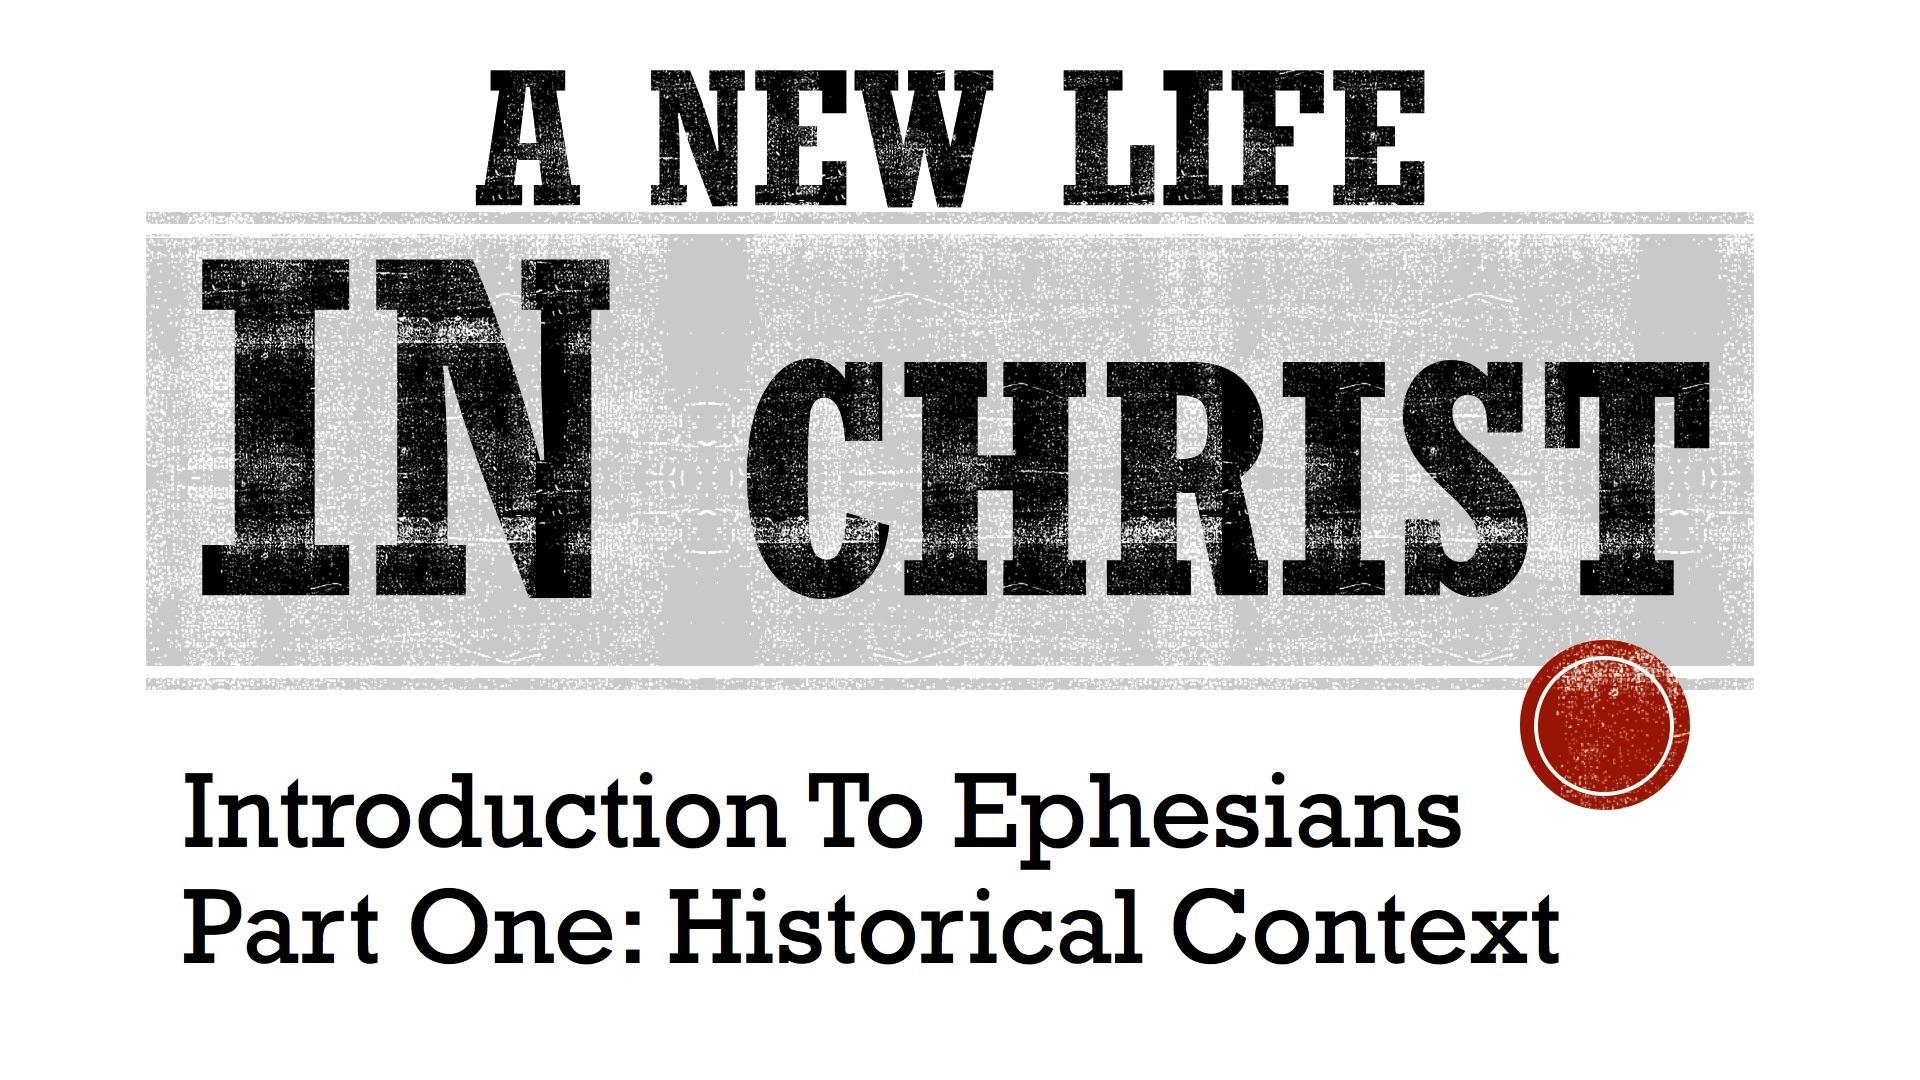 2018JAN28 - Sermon #5. Calvary Bible Church. 1.28.18 Intro to Ephesians 1.jpg